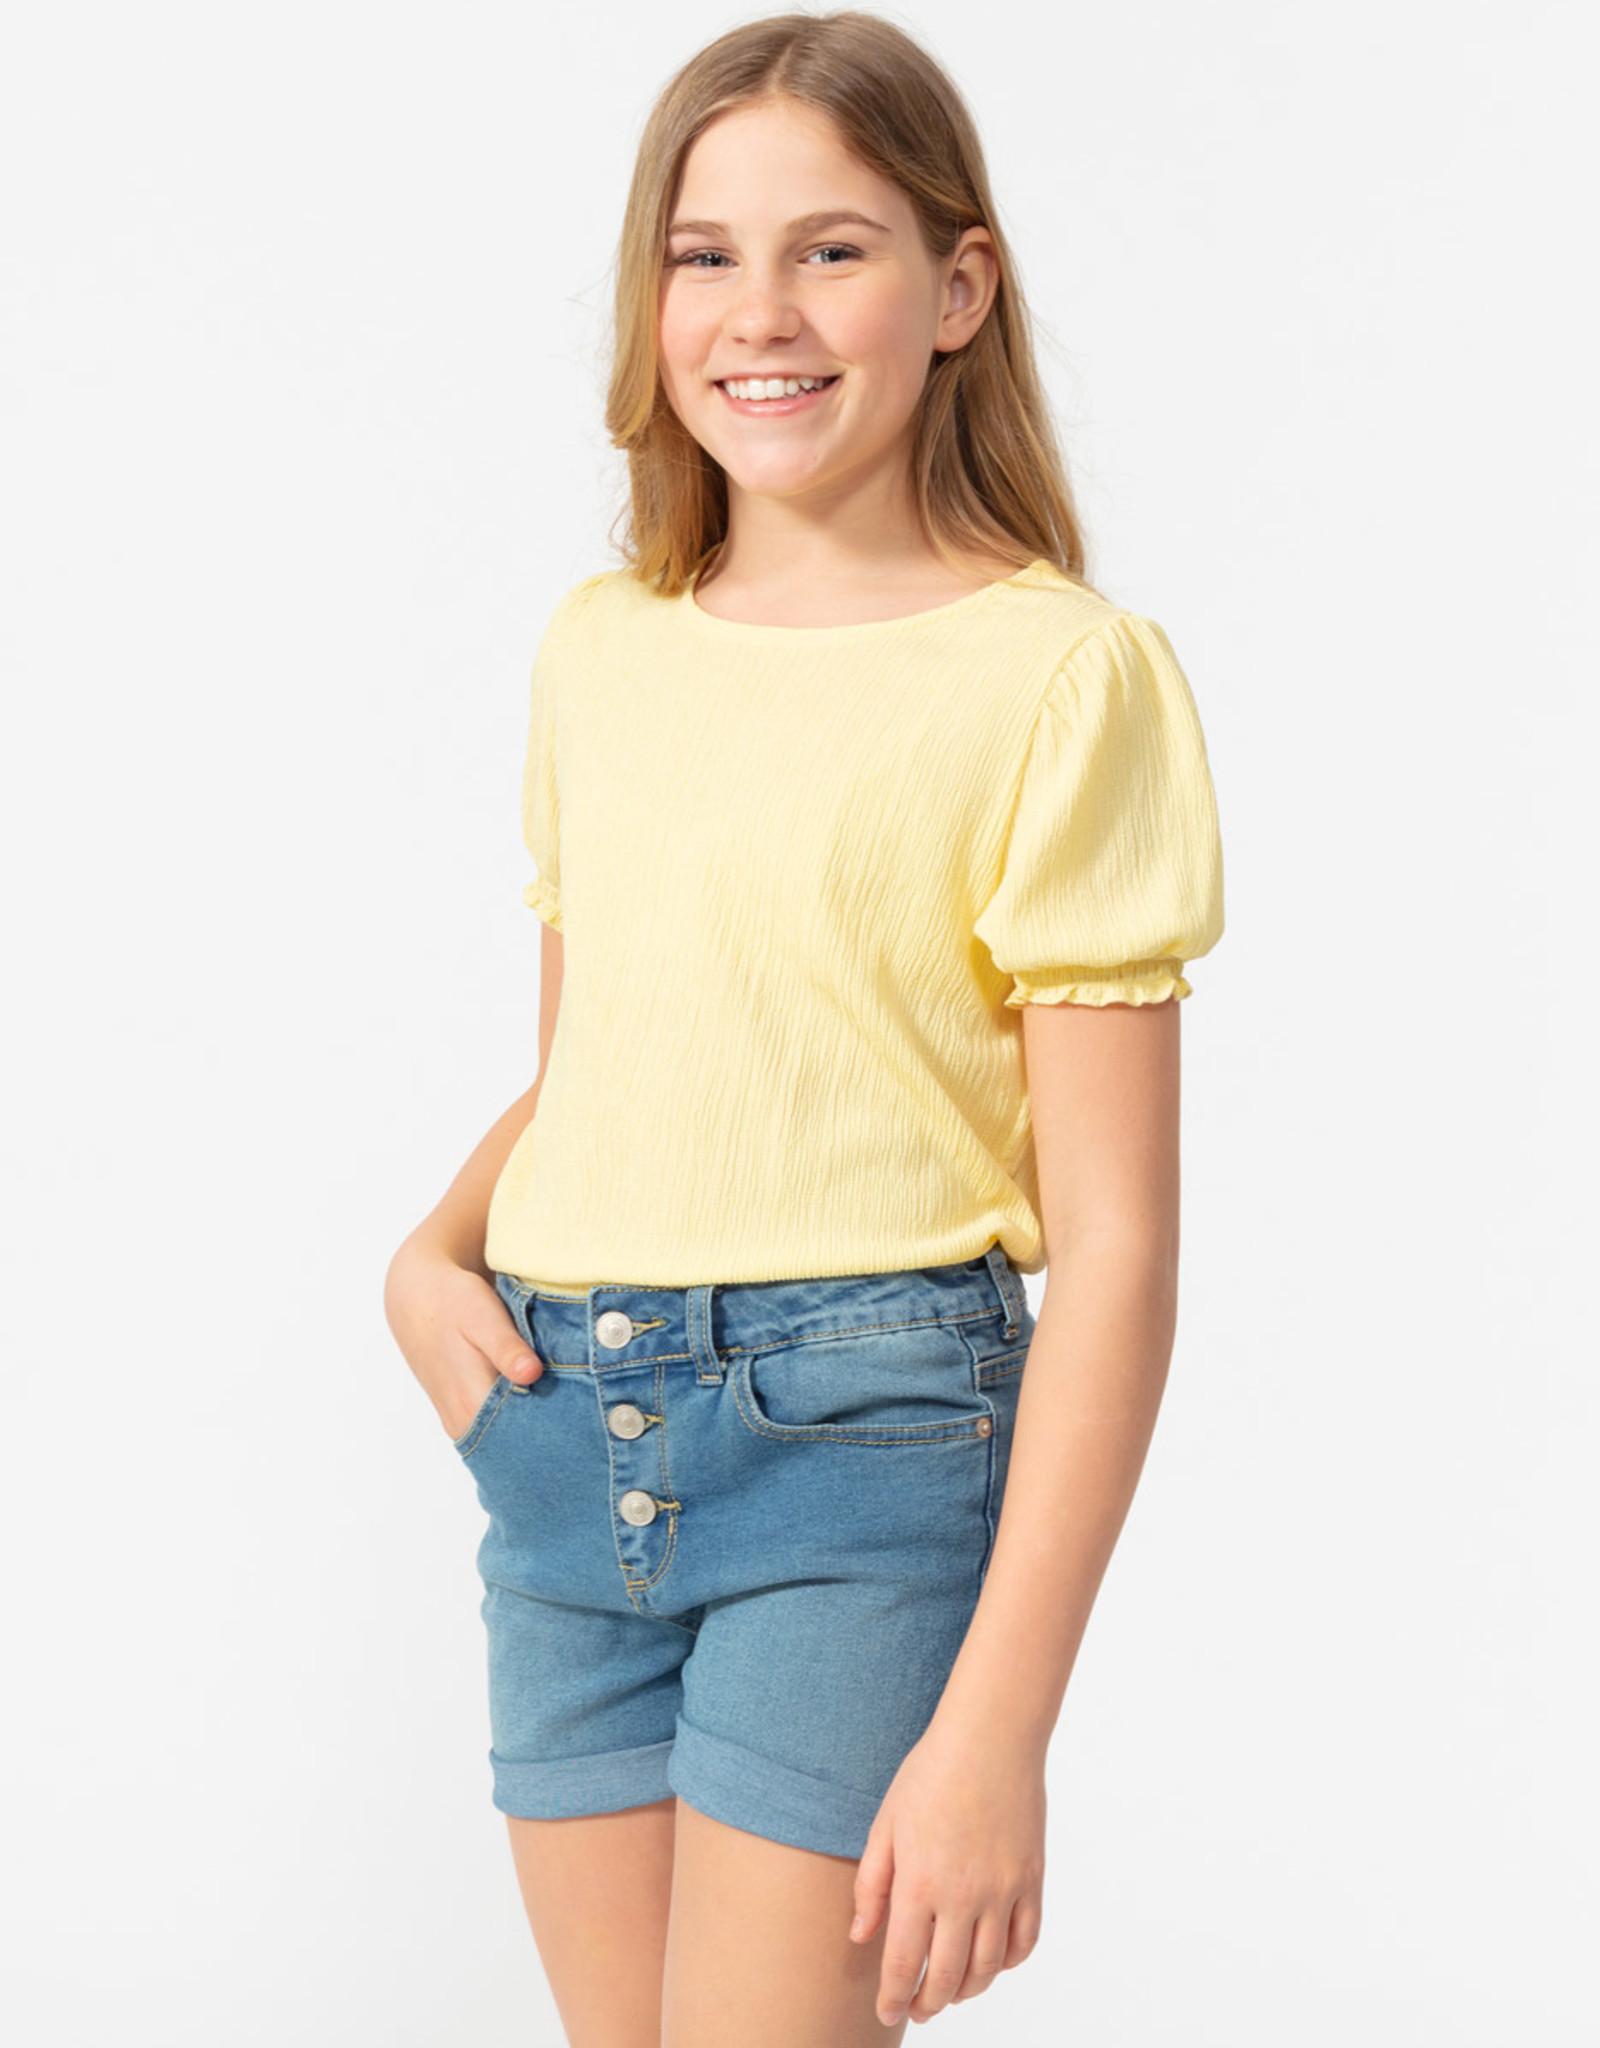 SP21 G Yth Yellow Blouse